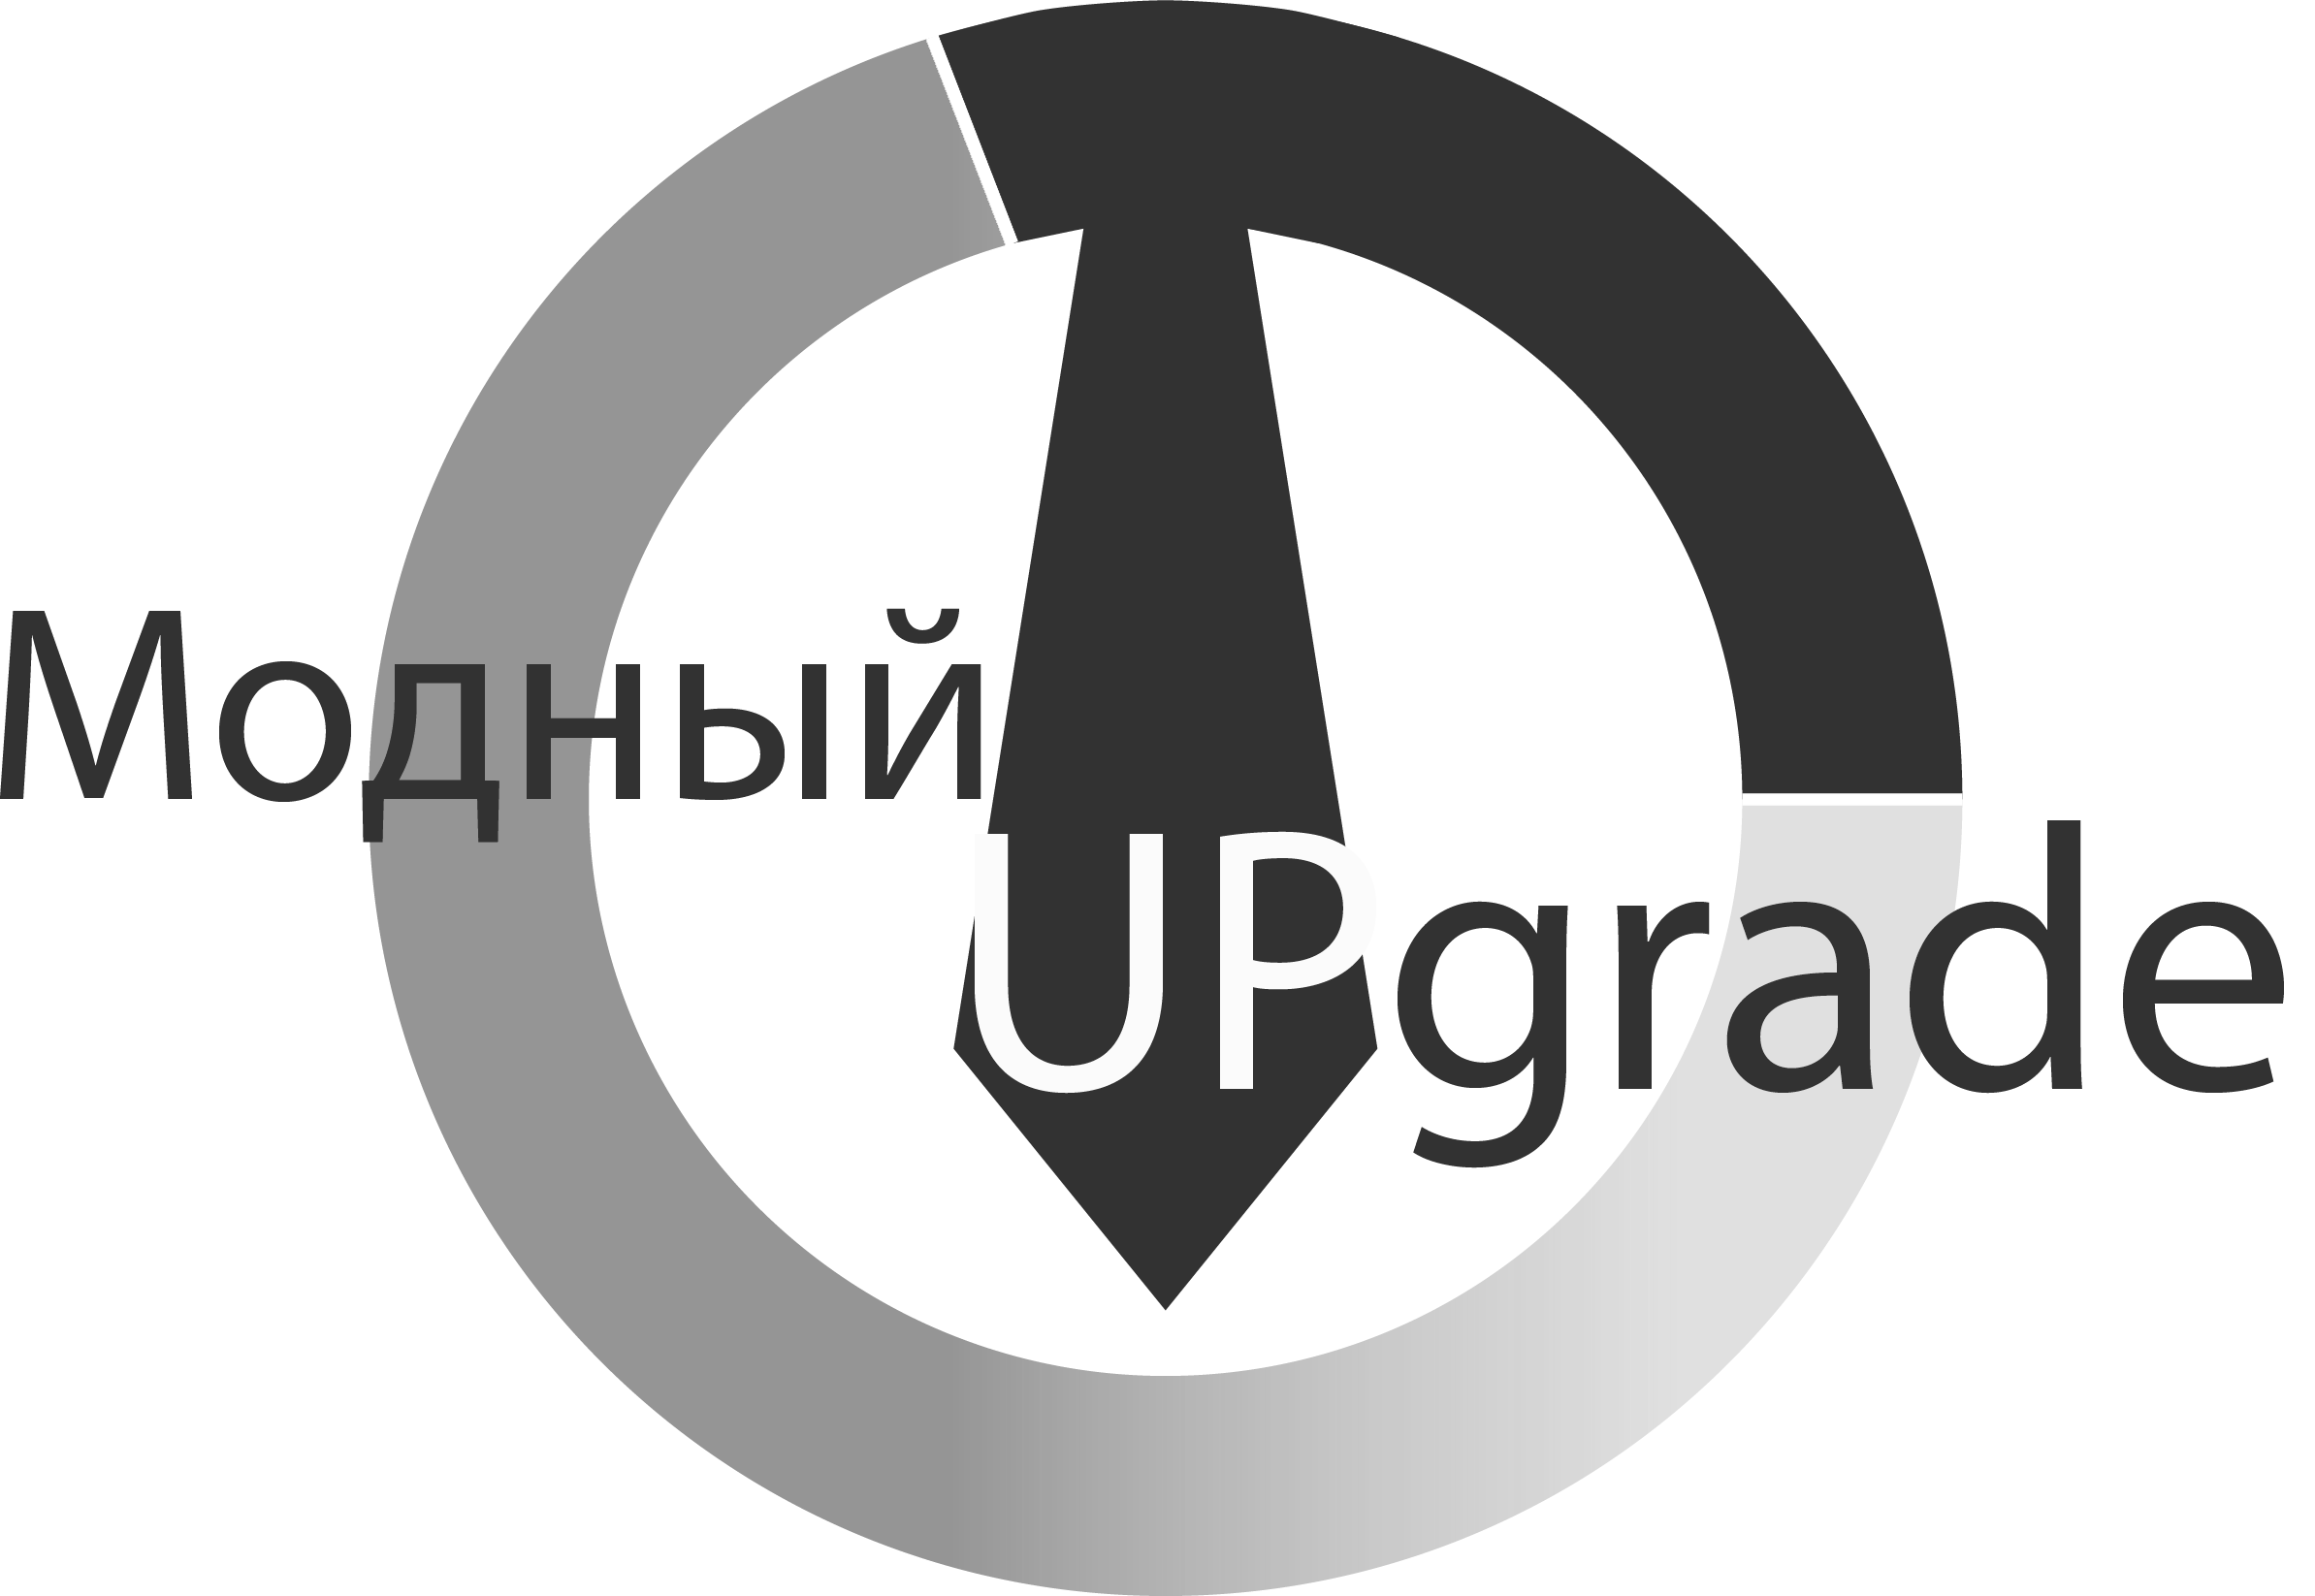 "Логотип интернет магазина ""Модный UPGRADE"" фото f_20959437596e8ab2.png"